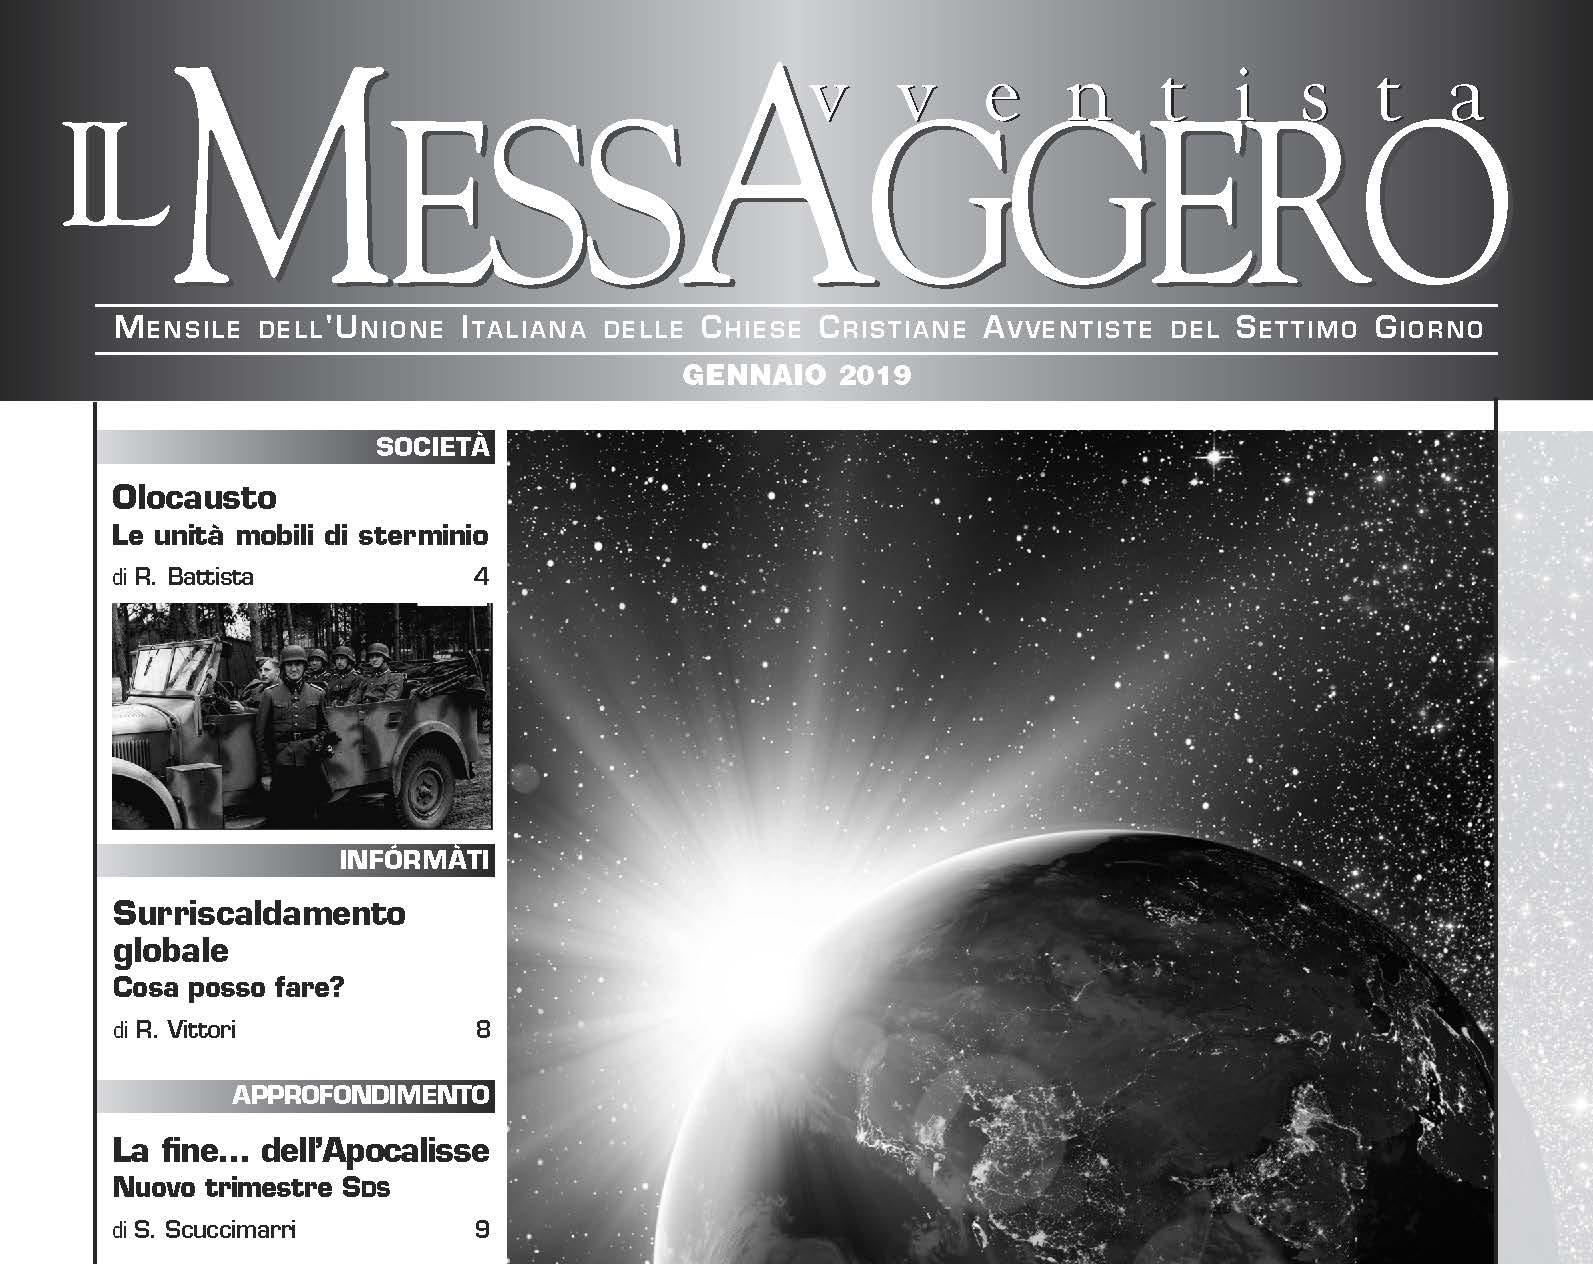 Messaggero - Gen. 2019